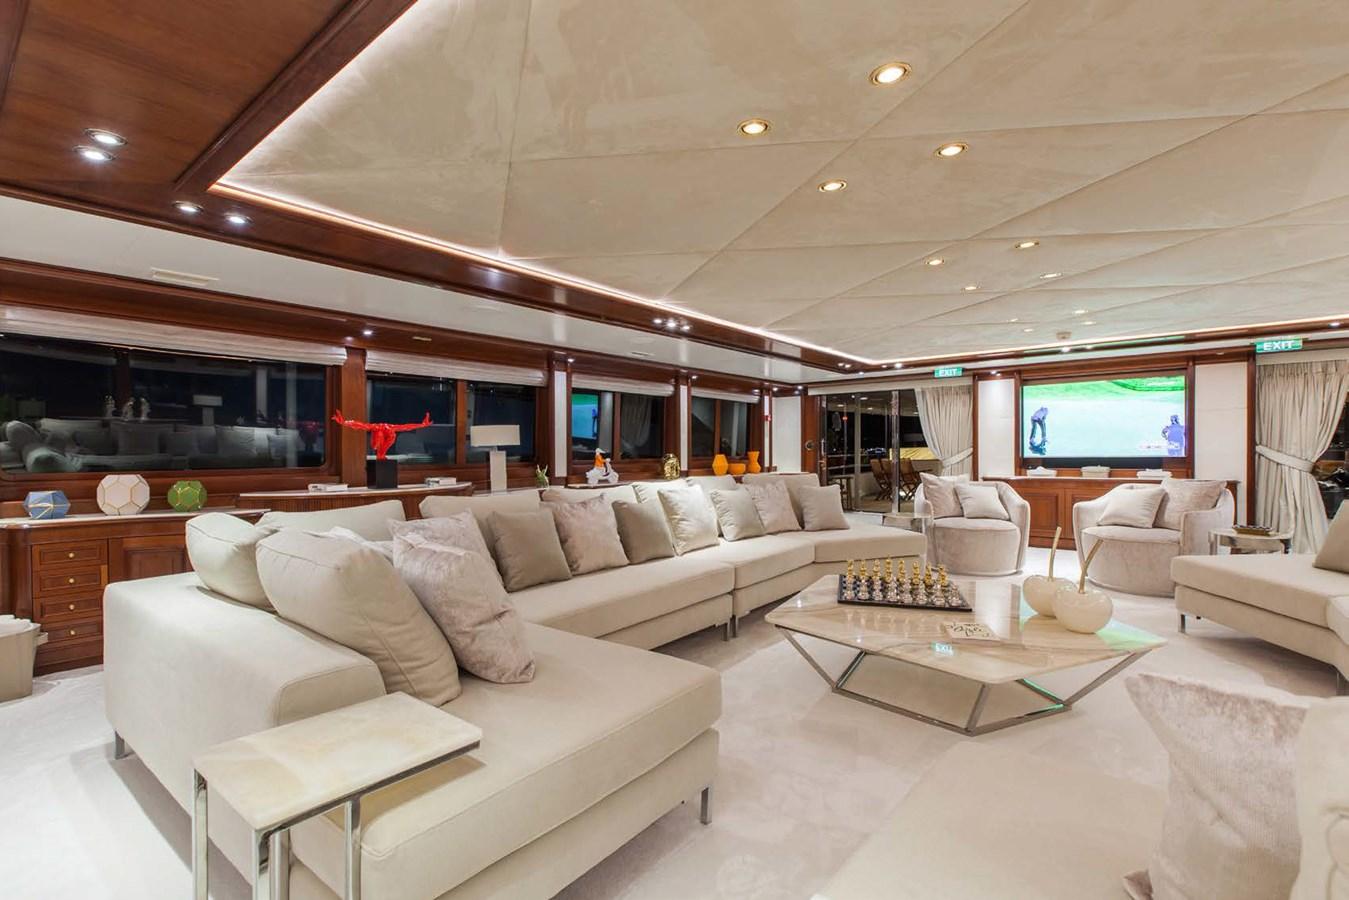 002 O'Mega_271- main salon OMEGA_BROCHURE_10.18_LR_Page_14_Image_0001 2004 MITSUBISHI  Mega Yacht 2919756